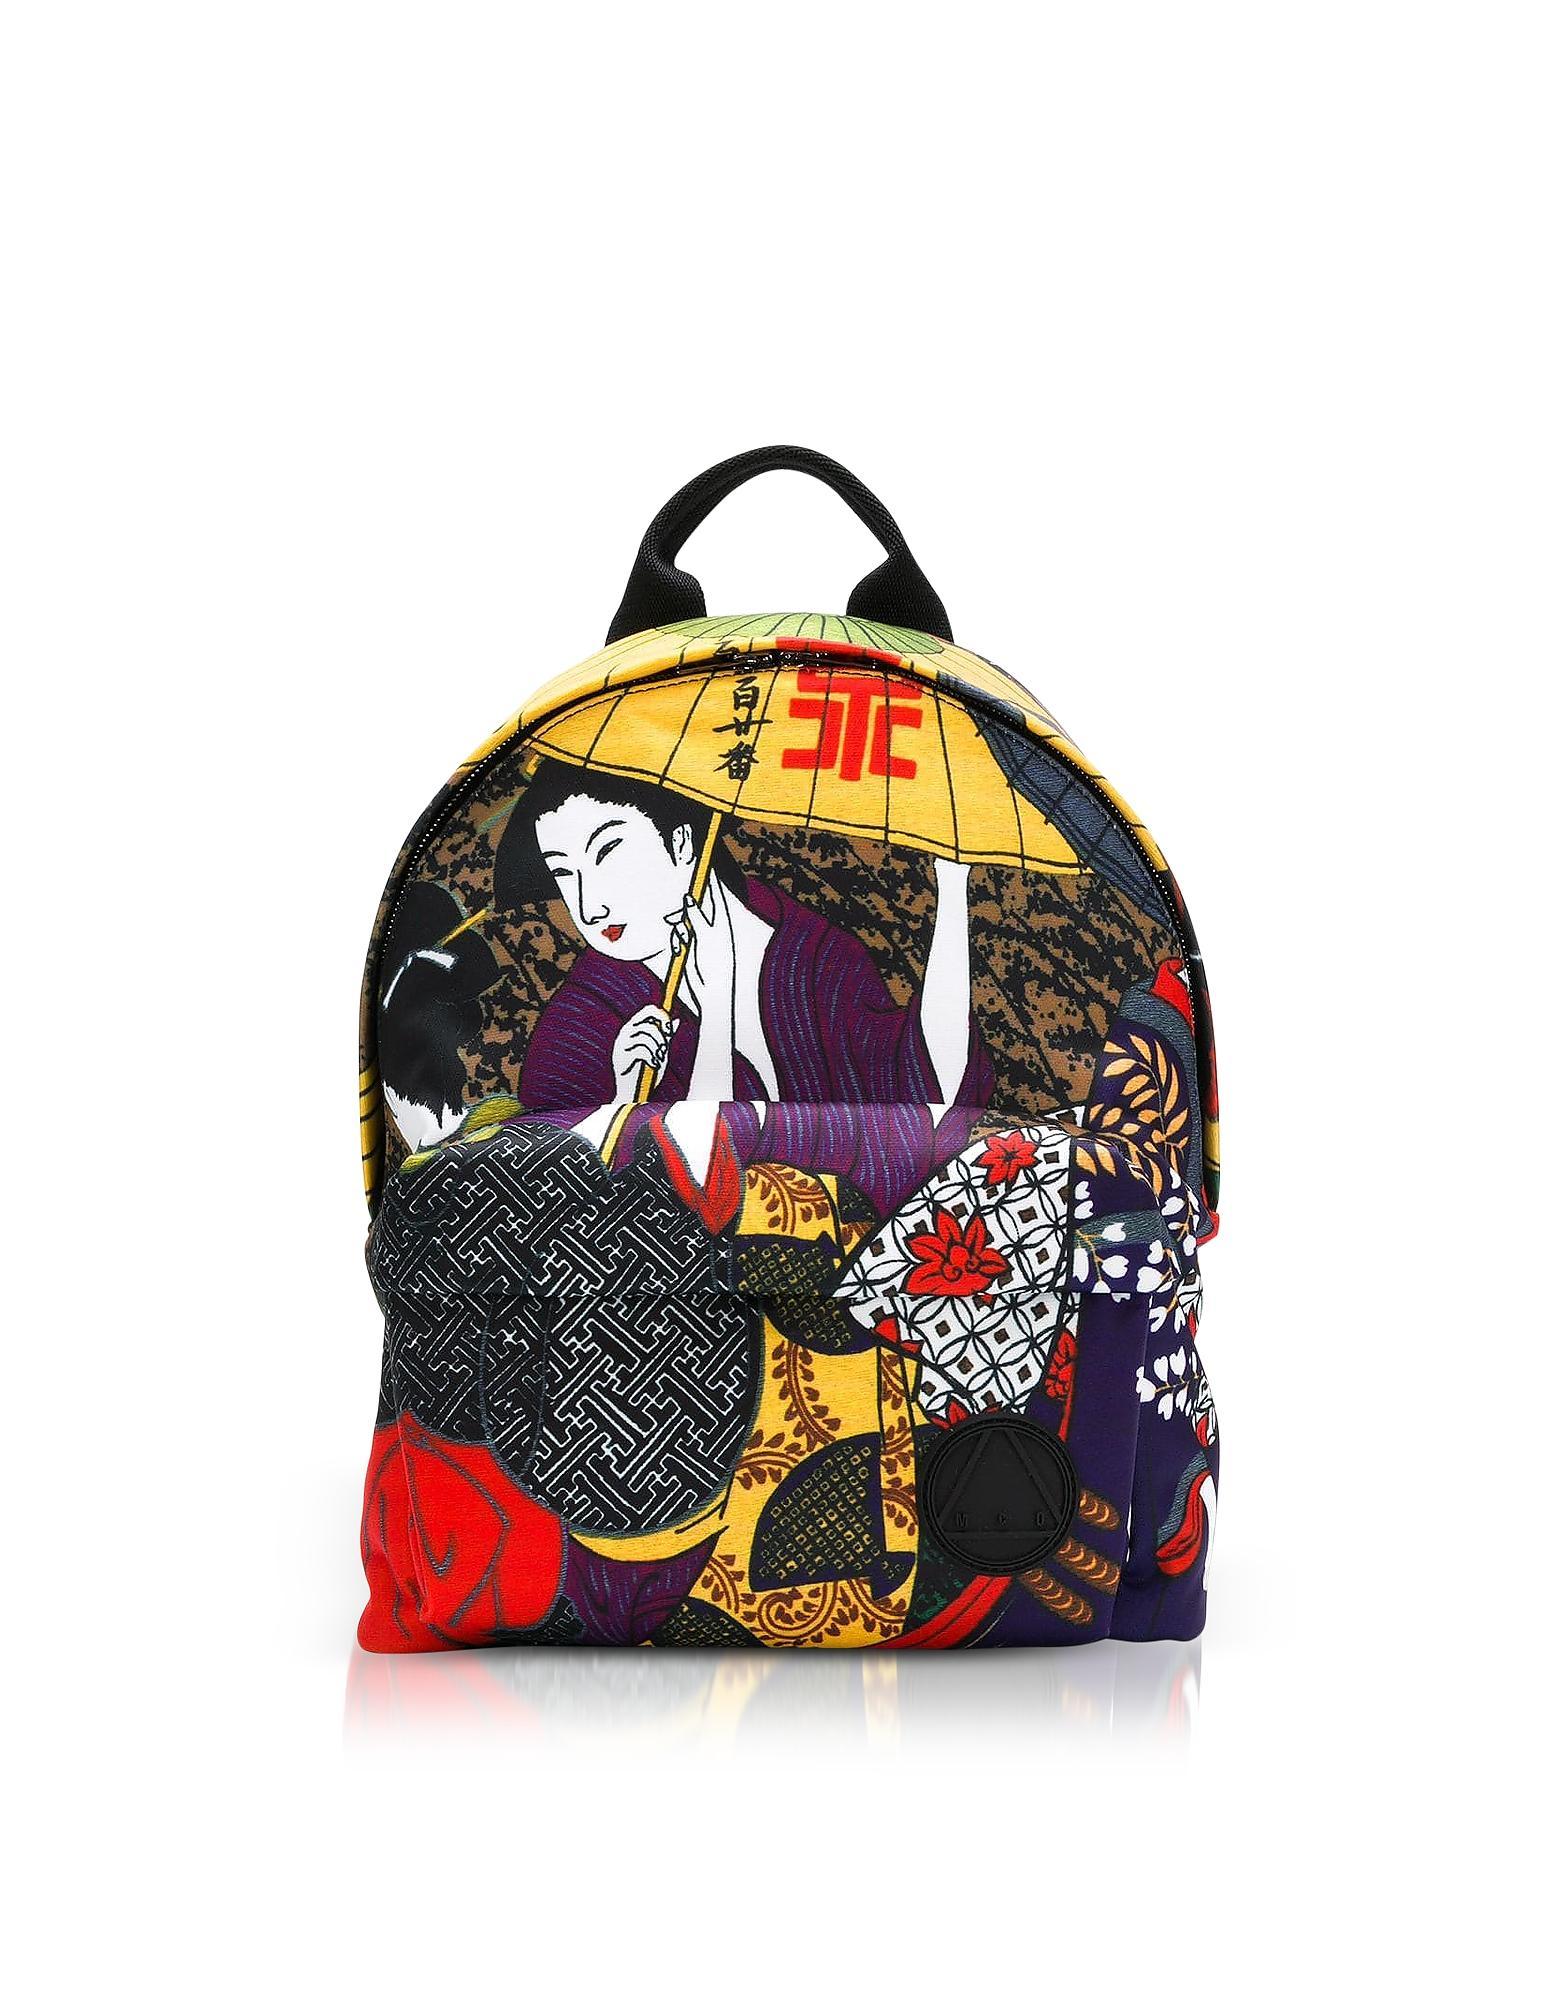 985048dc2f7 Mcq By Alexander Mcqueen Mcq Alexander Mcqueen Kimono Girl Nylon Backpack  In Multicolor. FORZIERI